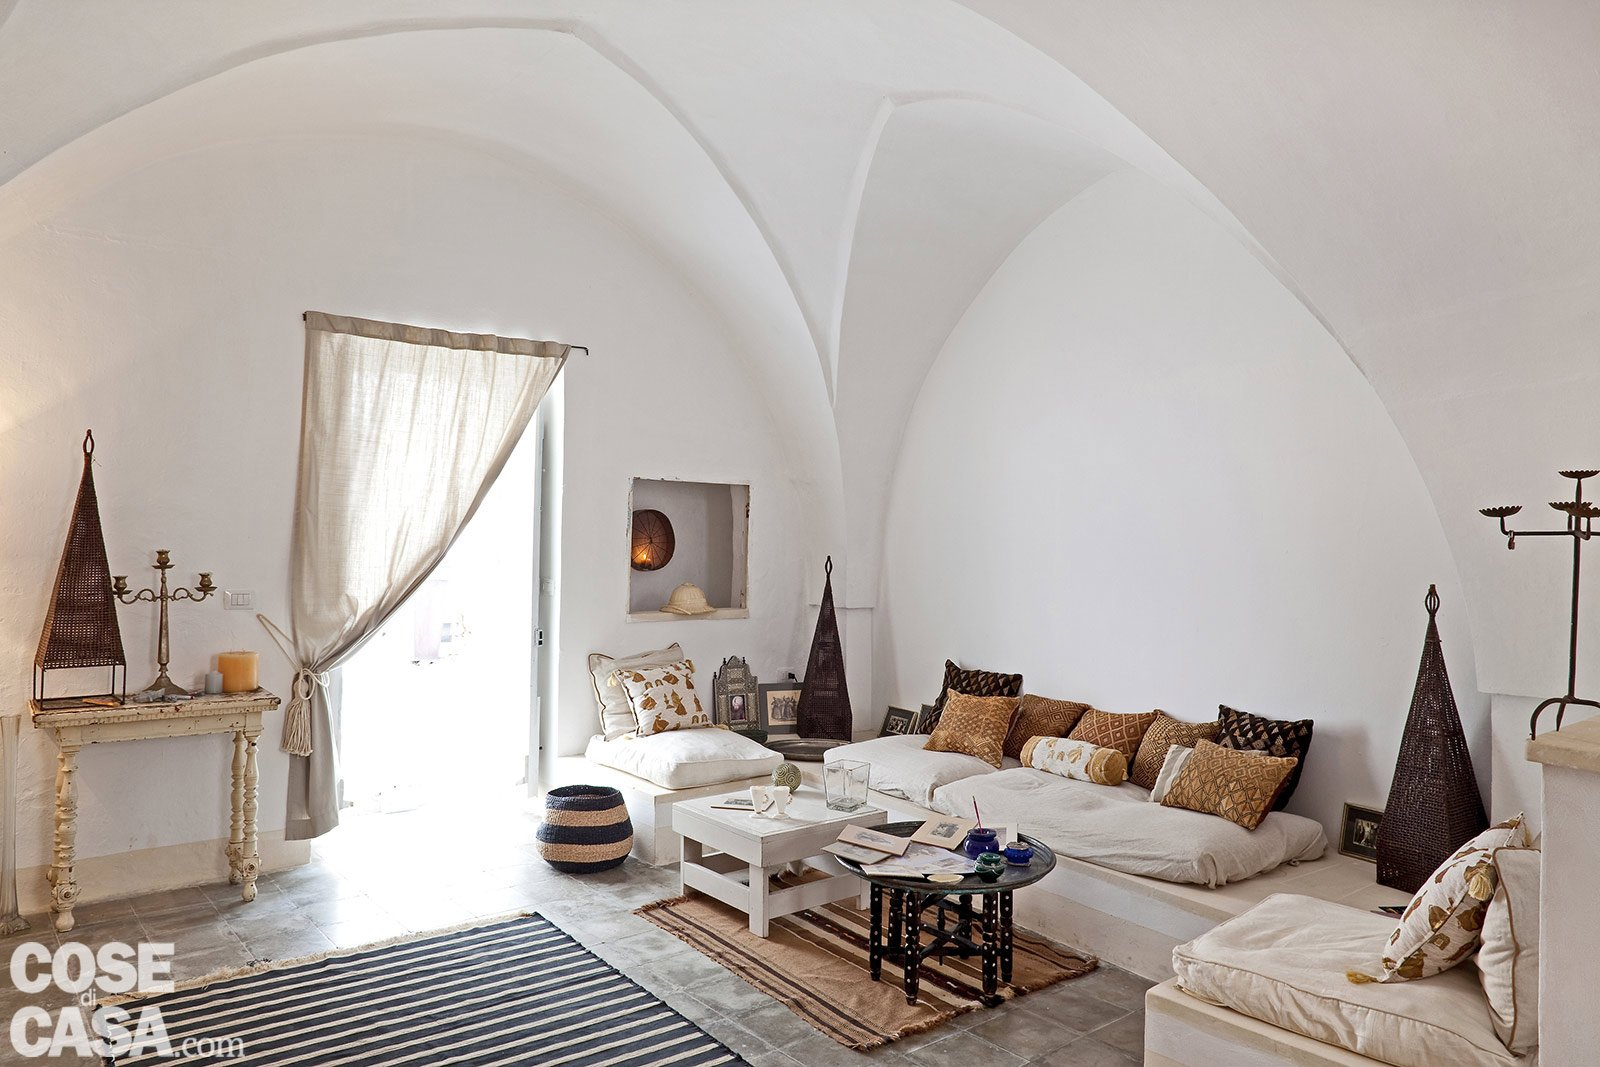 Arredamento Stile Mediterraneo : Una casa in pietra in stile mediterraneo cose di casa